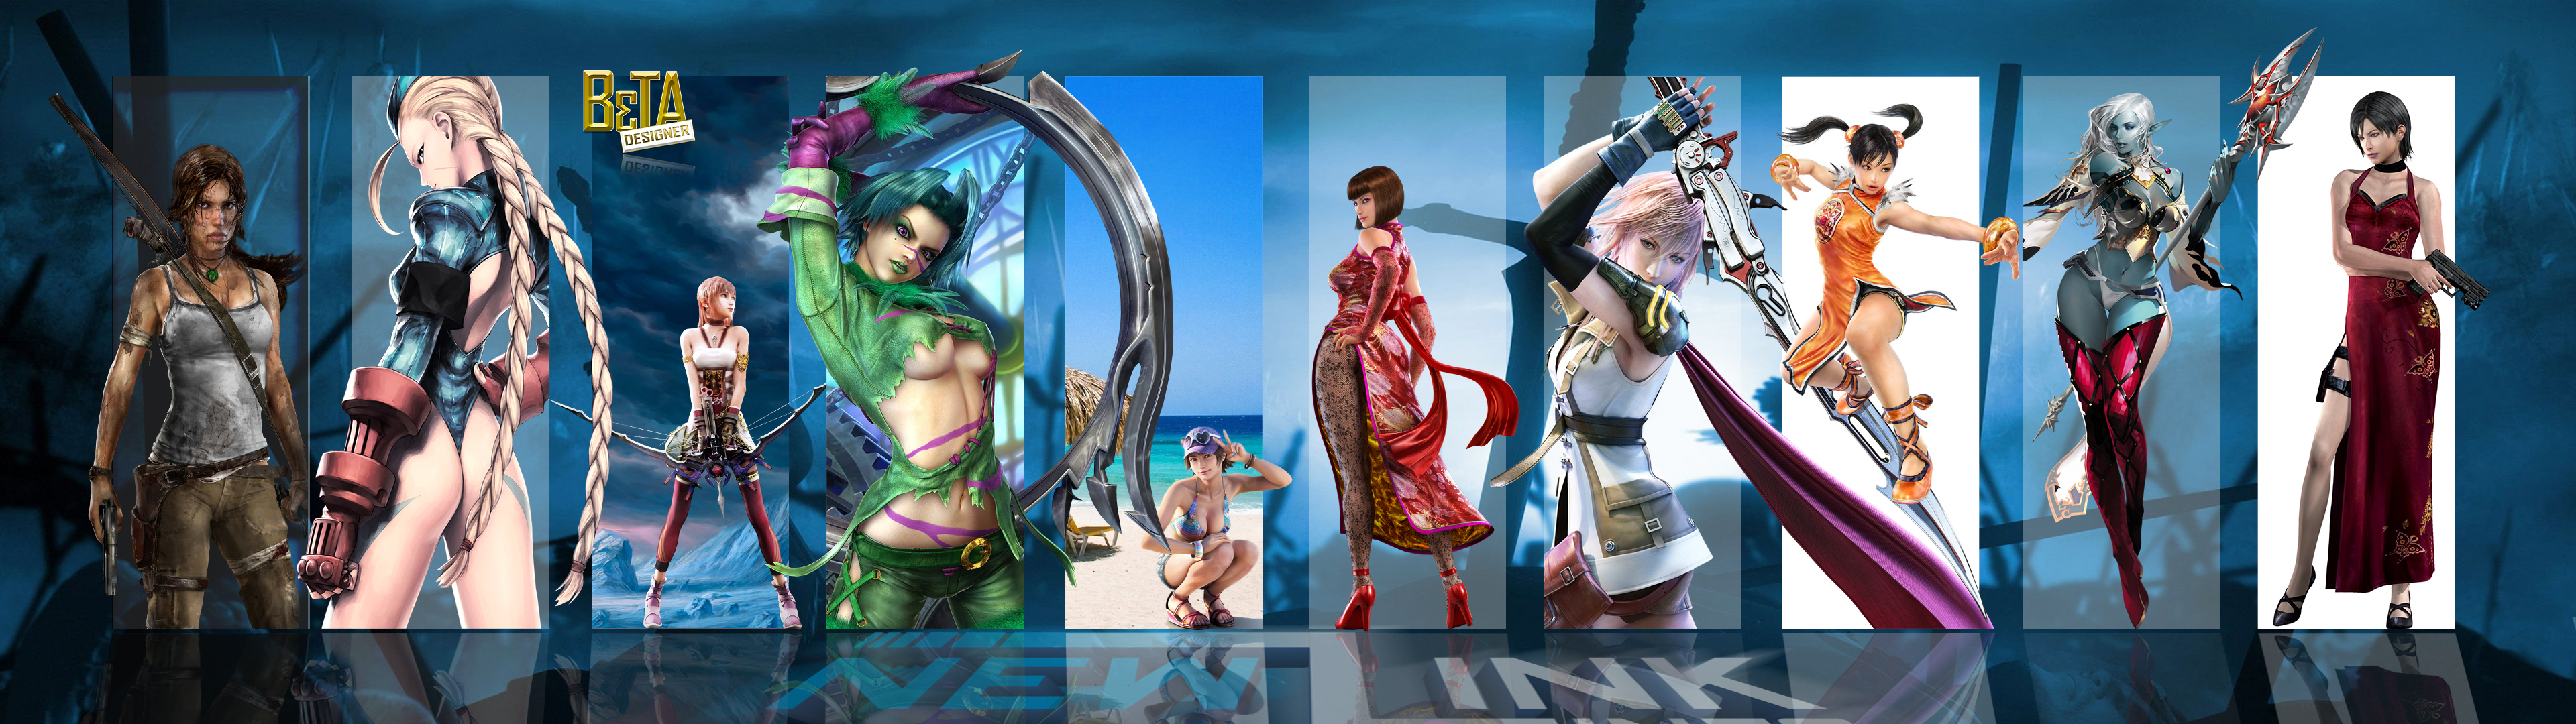 Best Games O1   Wallpaper Dual Monitor FULL HD by NewLinkGAMESDF on 3840x1080